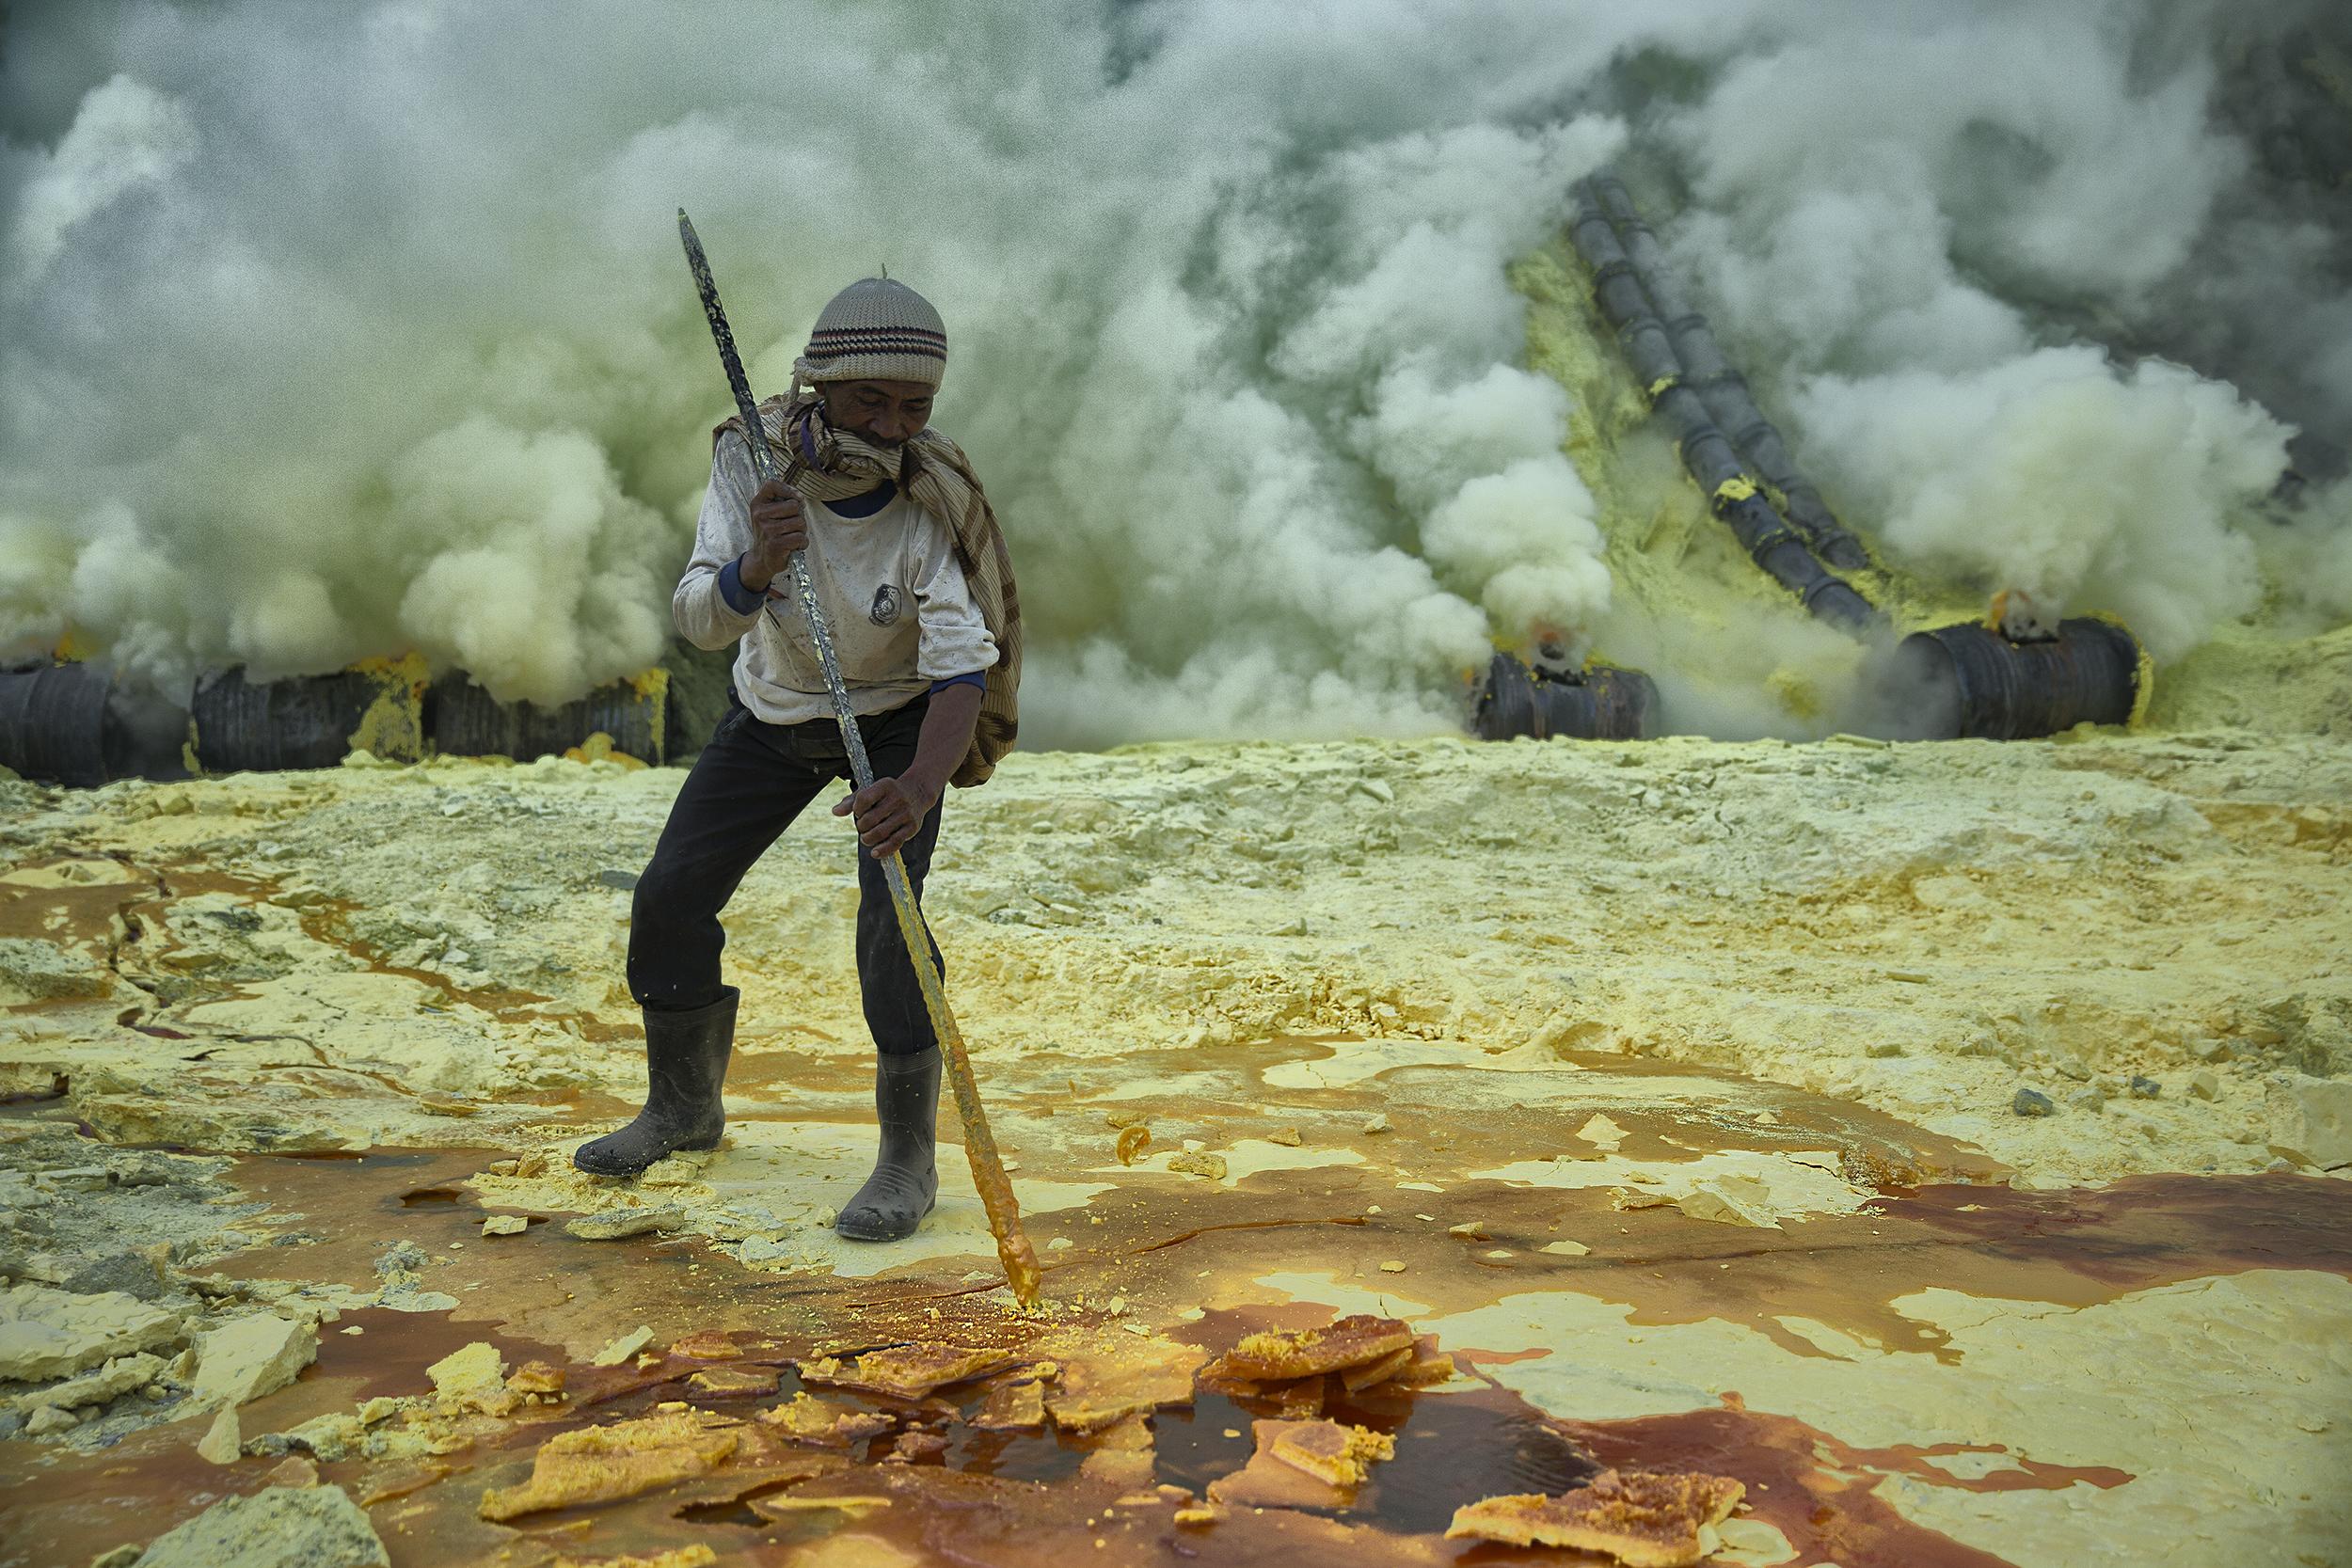 Collecting Sulphur, Ijen Volcano, Indonesia, 2012.